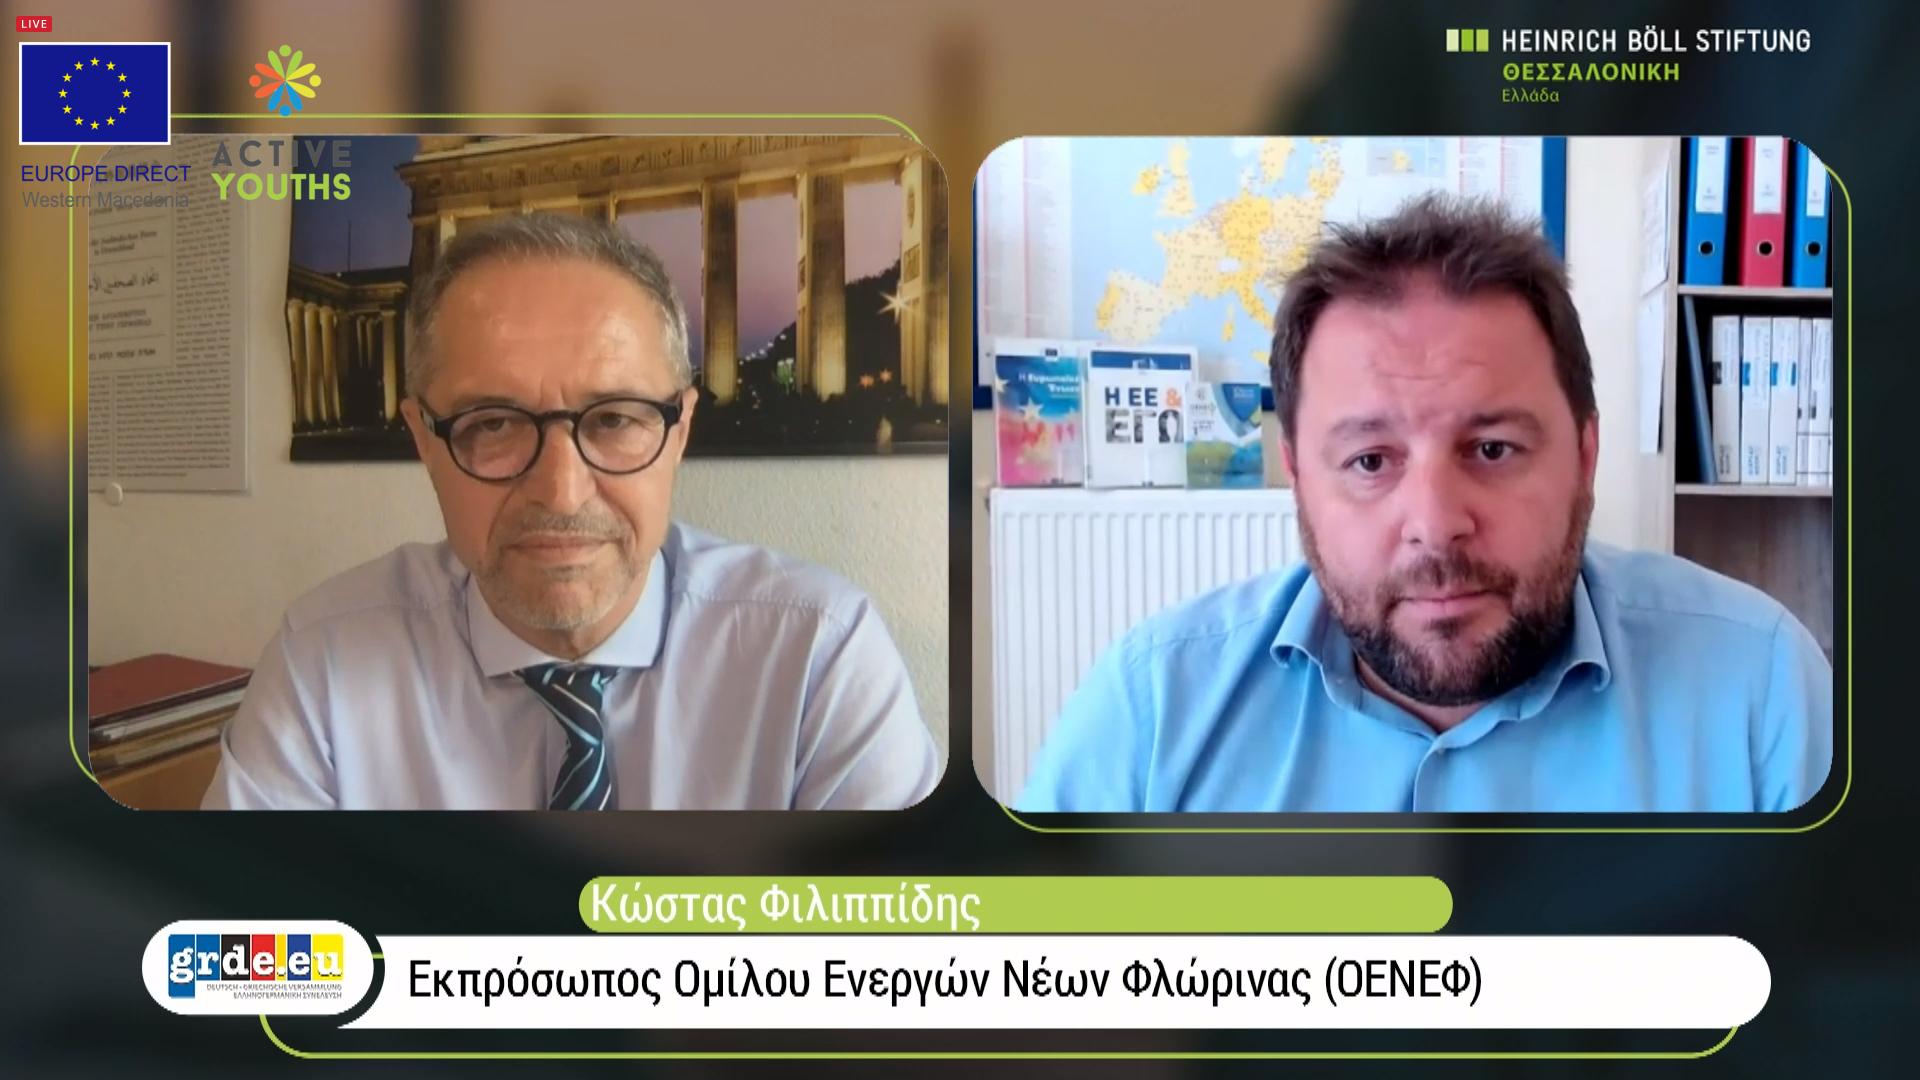 O ΟΕΝΕΦ - EDIC Δυτικής Μακεδονίας συμμετείχε στη διαδικτυακή εκδήλωση της Ελληνογερμανικής Συνέλευσης & του Ιδρύματος Χάινριχ Μπελ